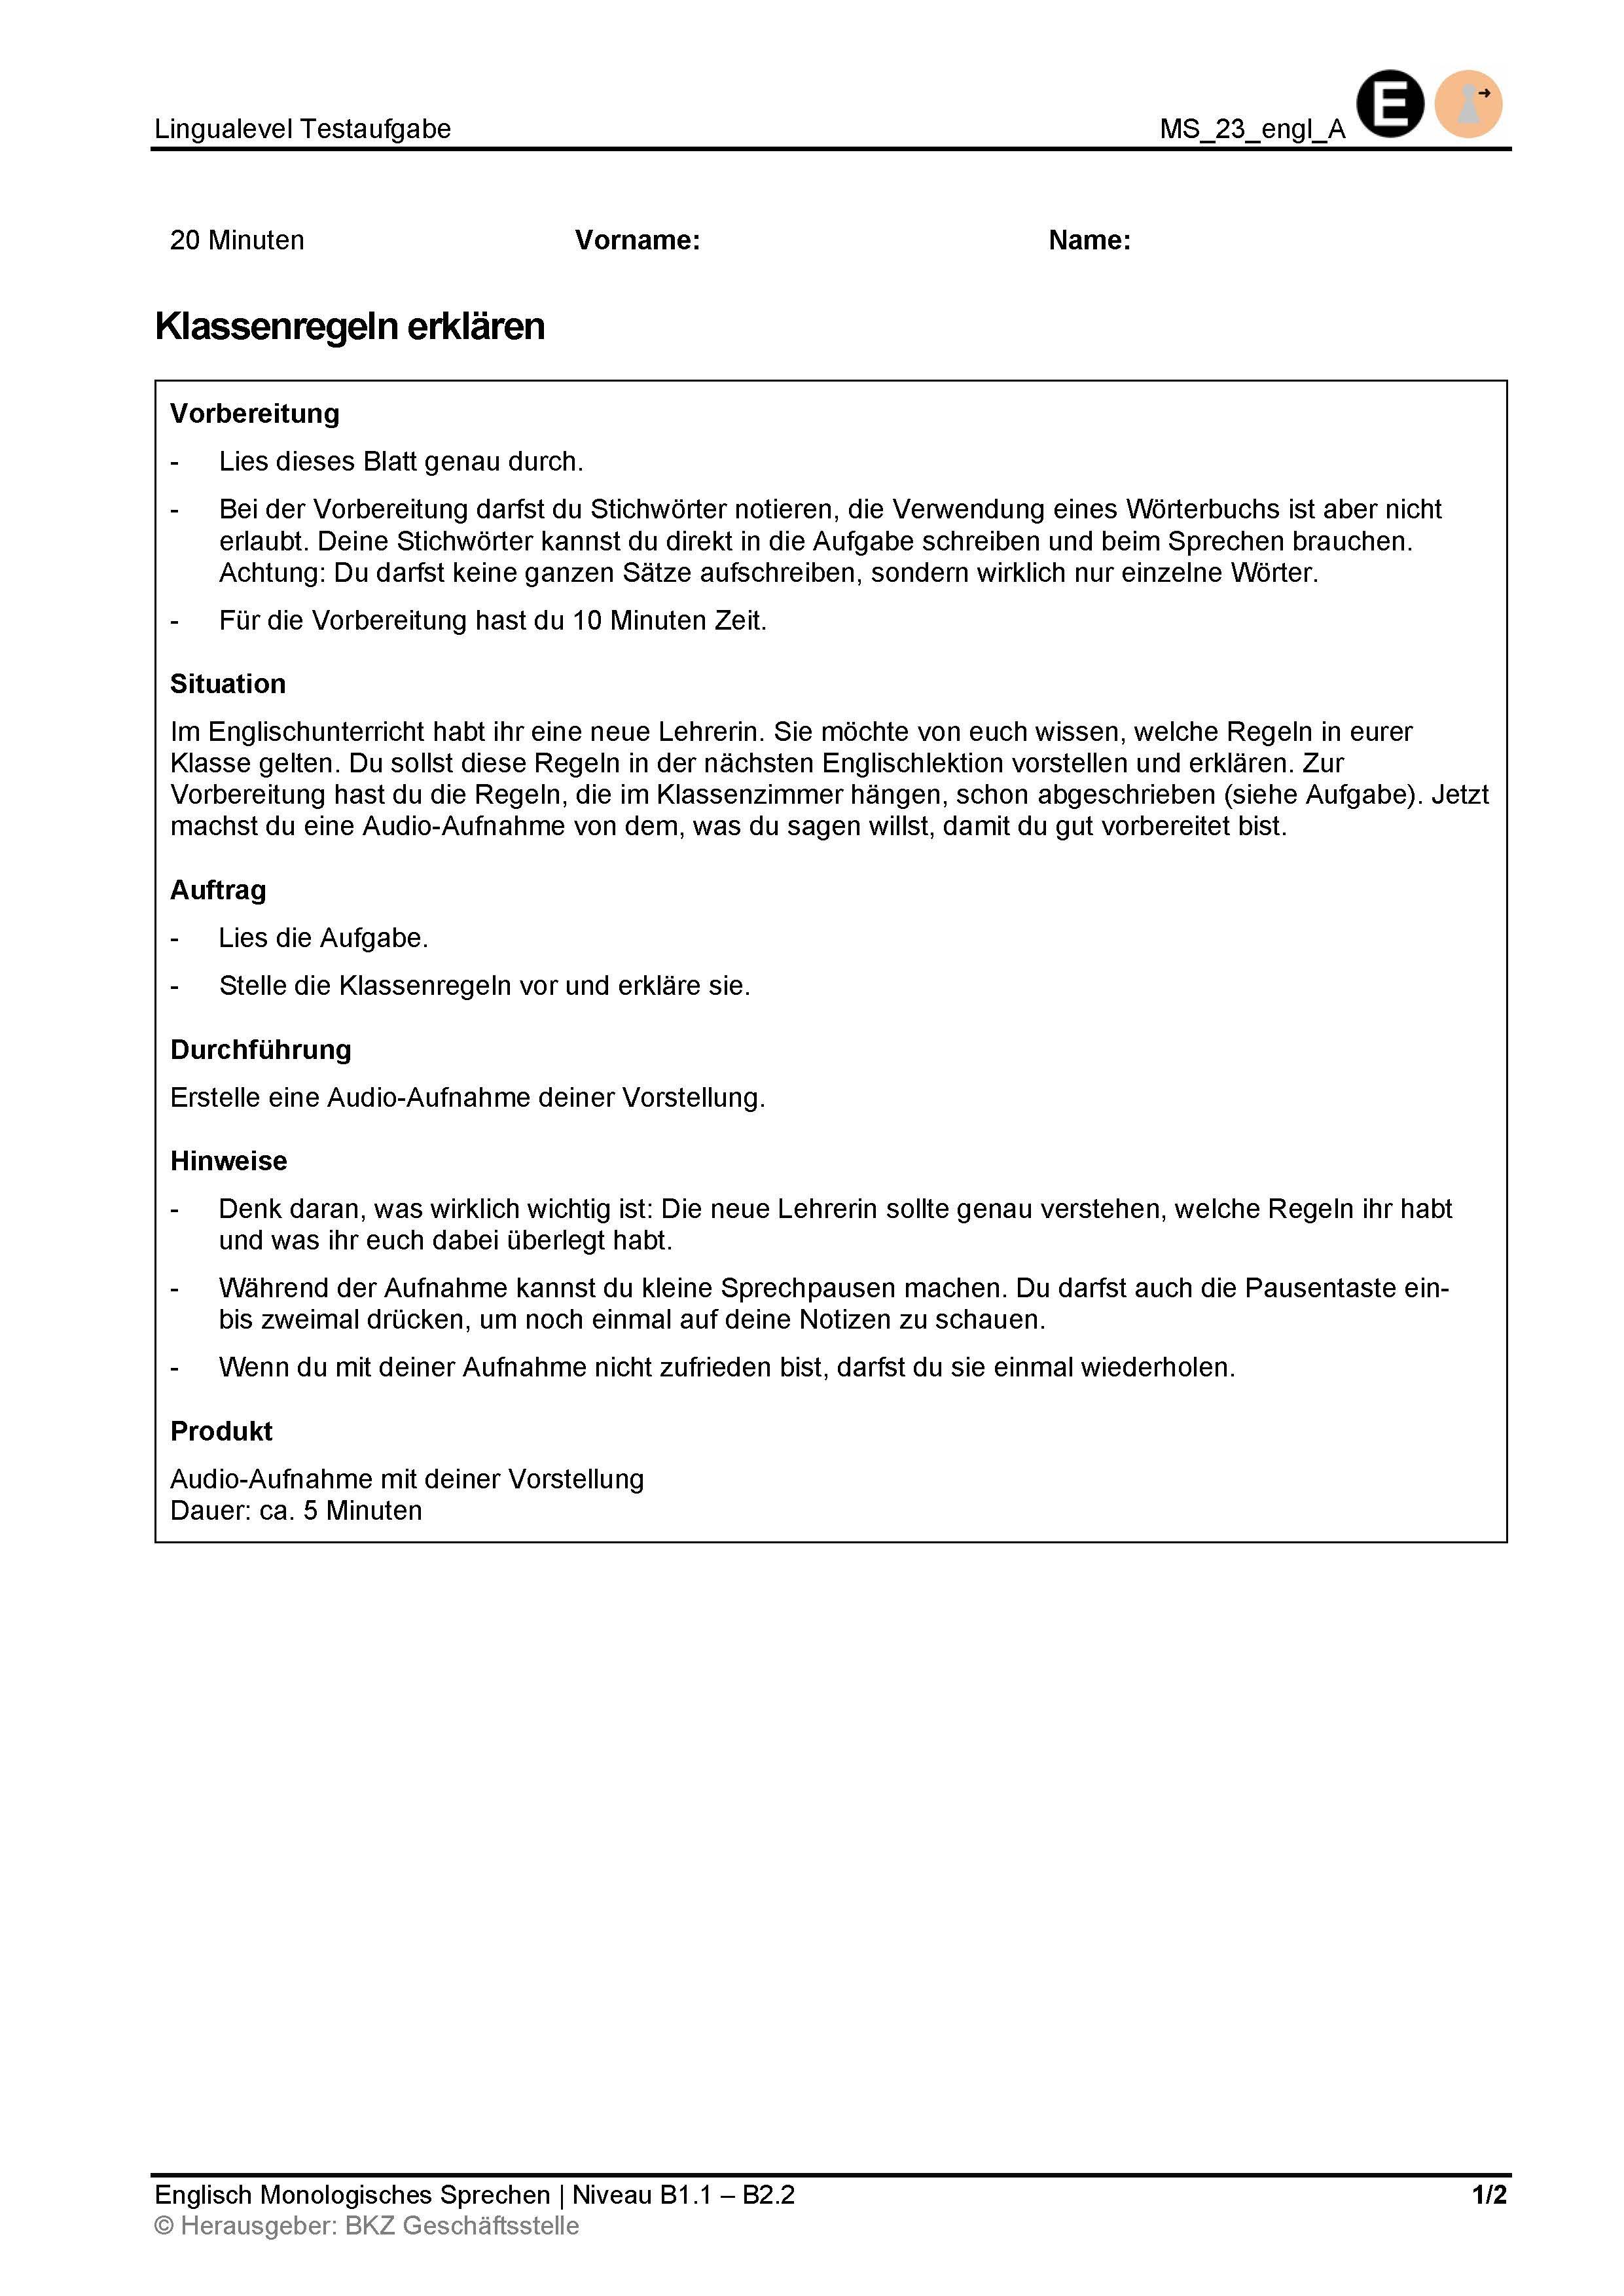 Preview image for LOM object Monologisches Sprechen: Klassenregeln erklären